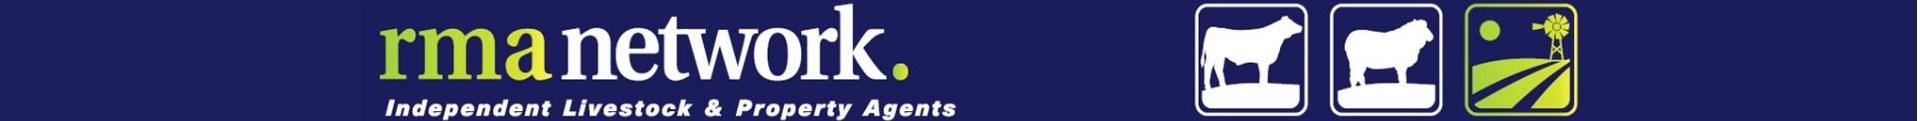 rma network banner